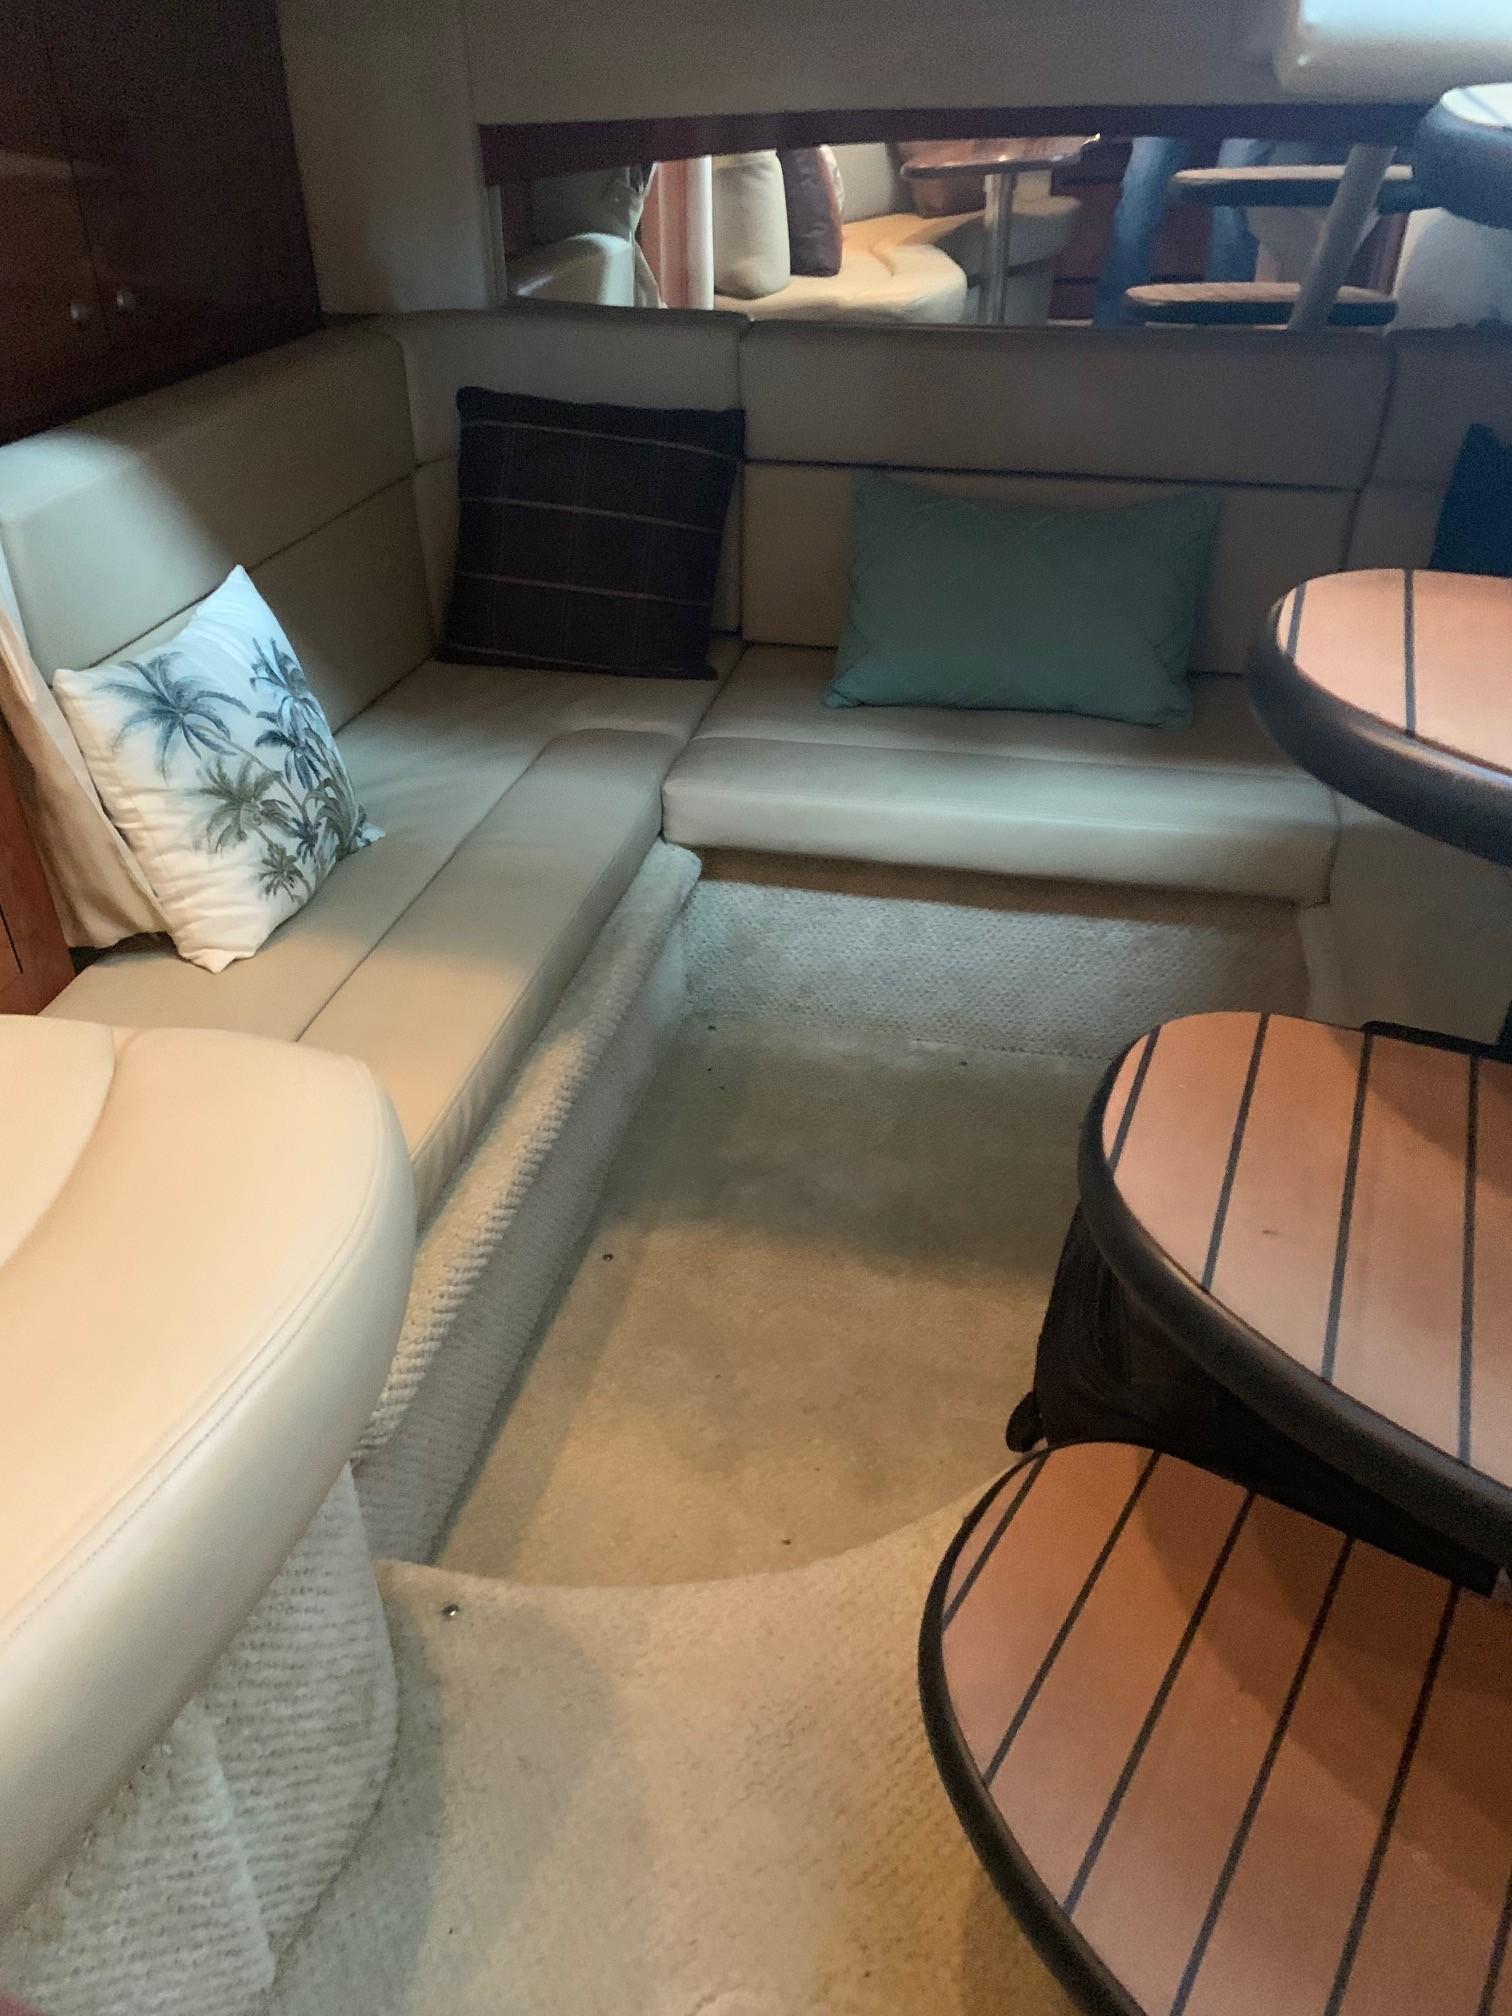 Sea Ray 320 Sundancer - Aft Seating/Cabin